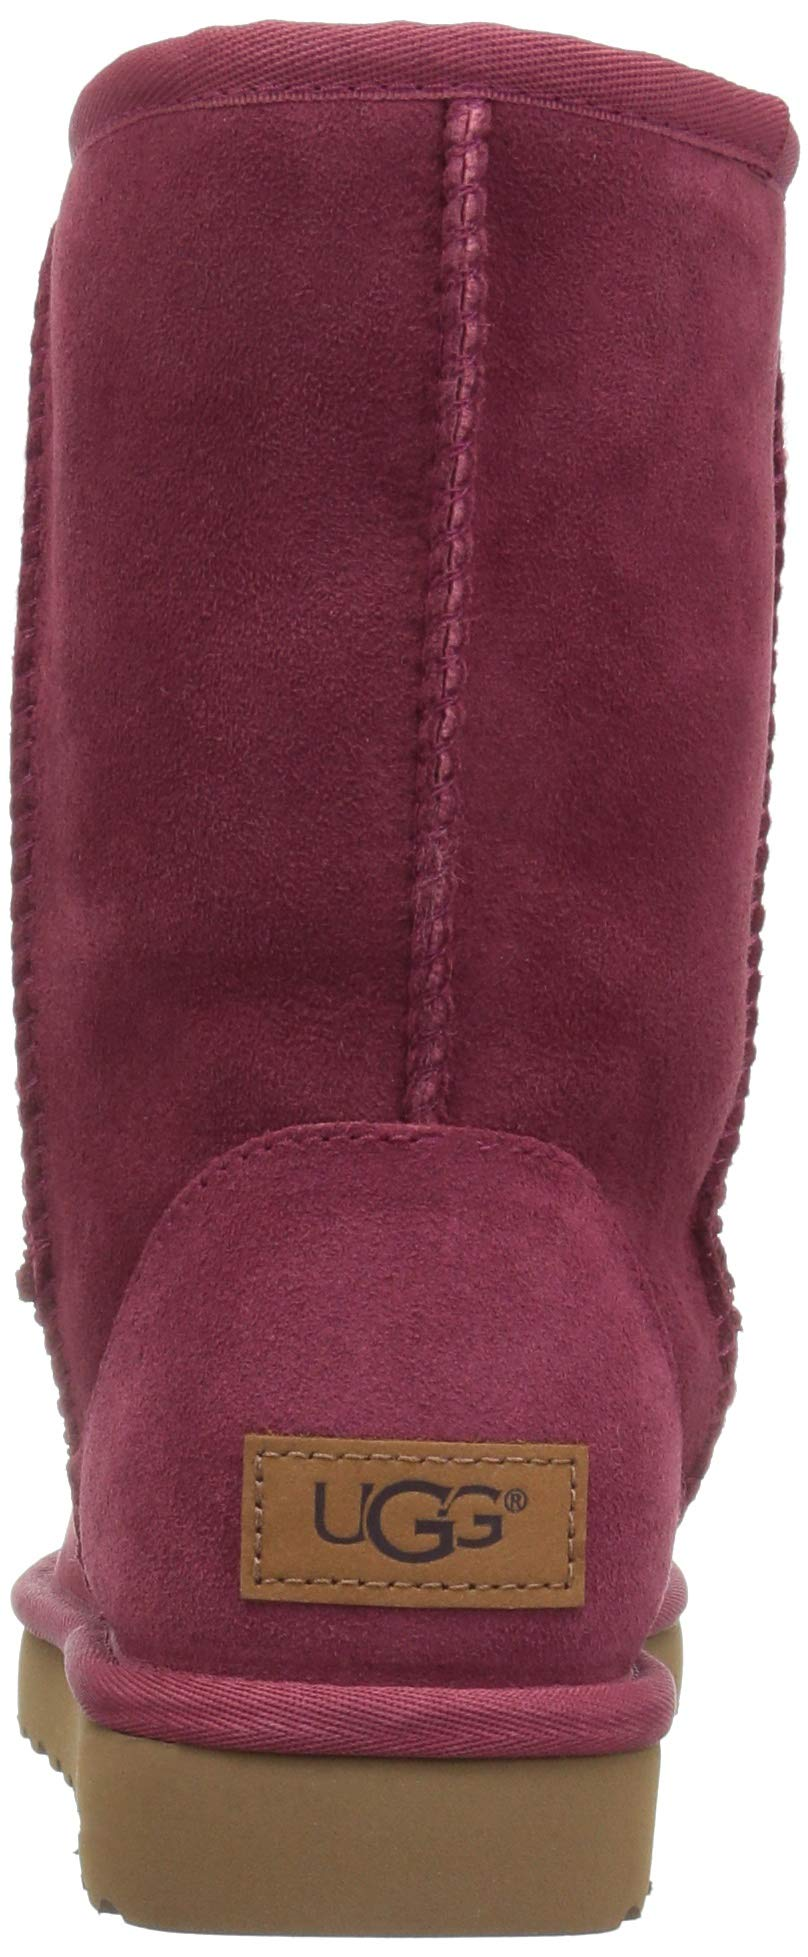 d8df0ae1806 UGG Classic Short II Garnet Red Water-resistant BOOTS Women US 10/ EUR 41